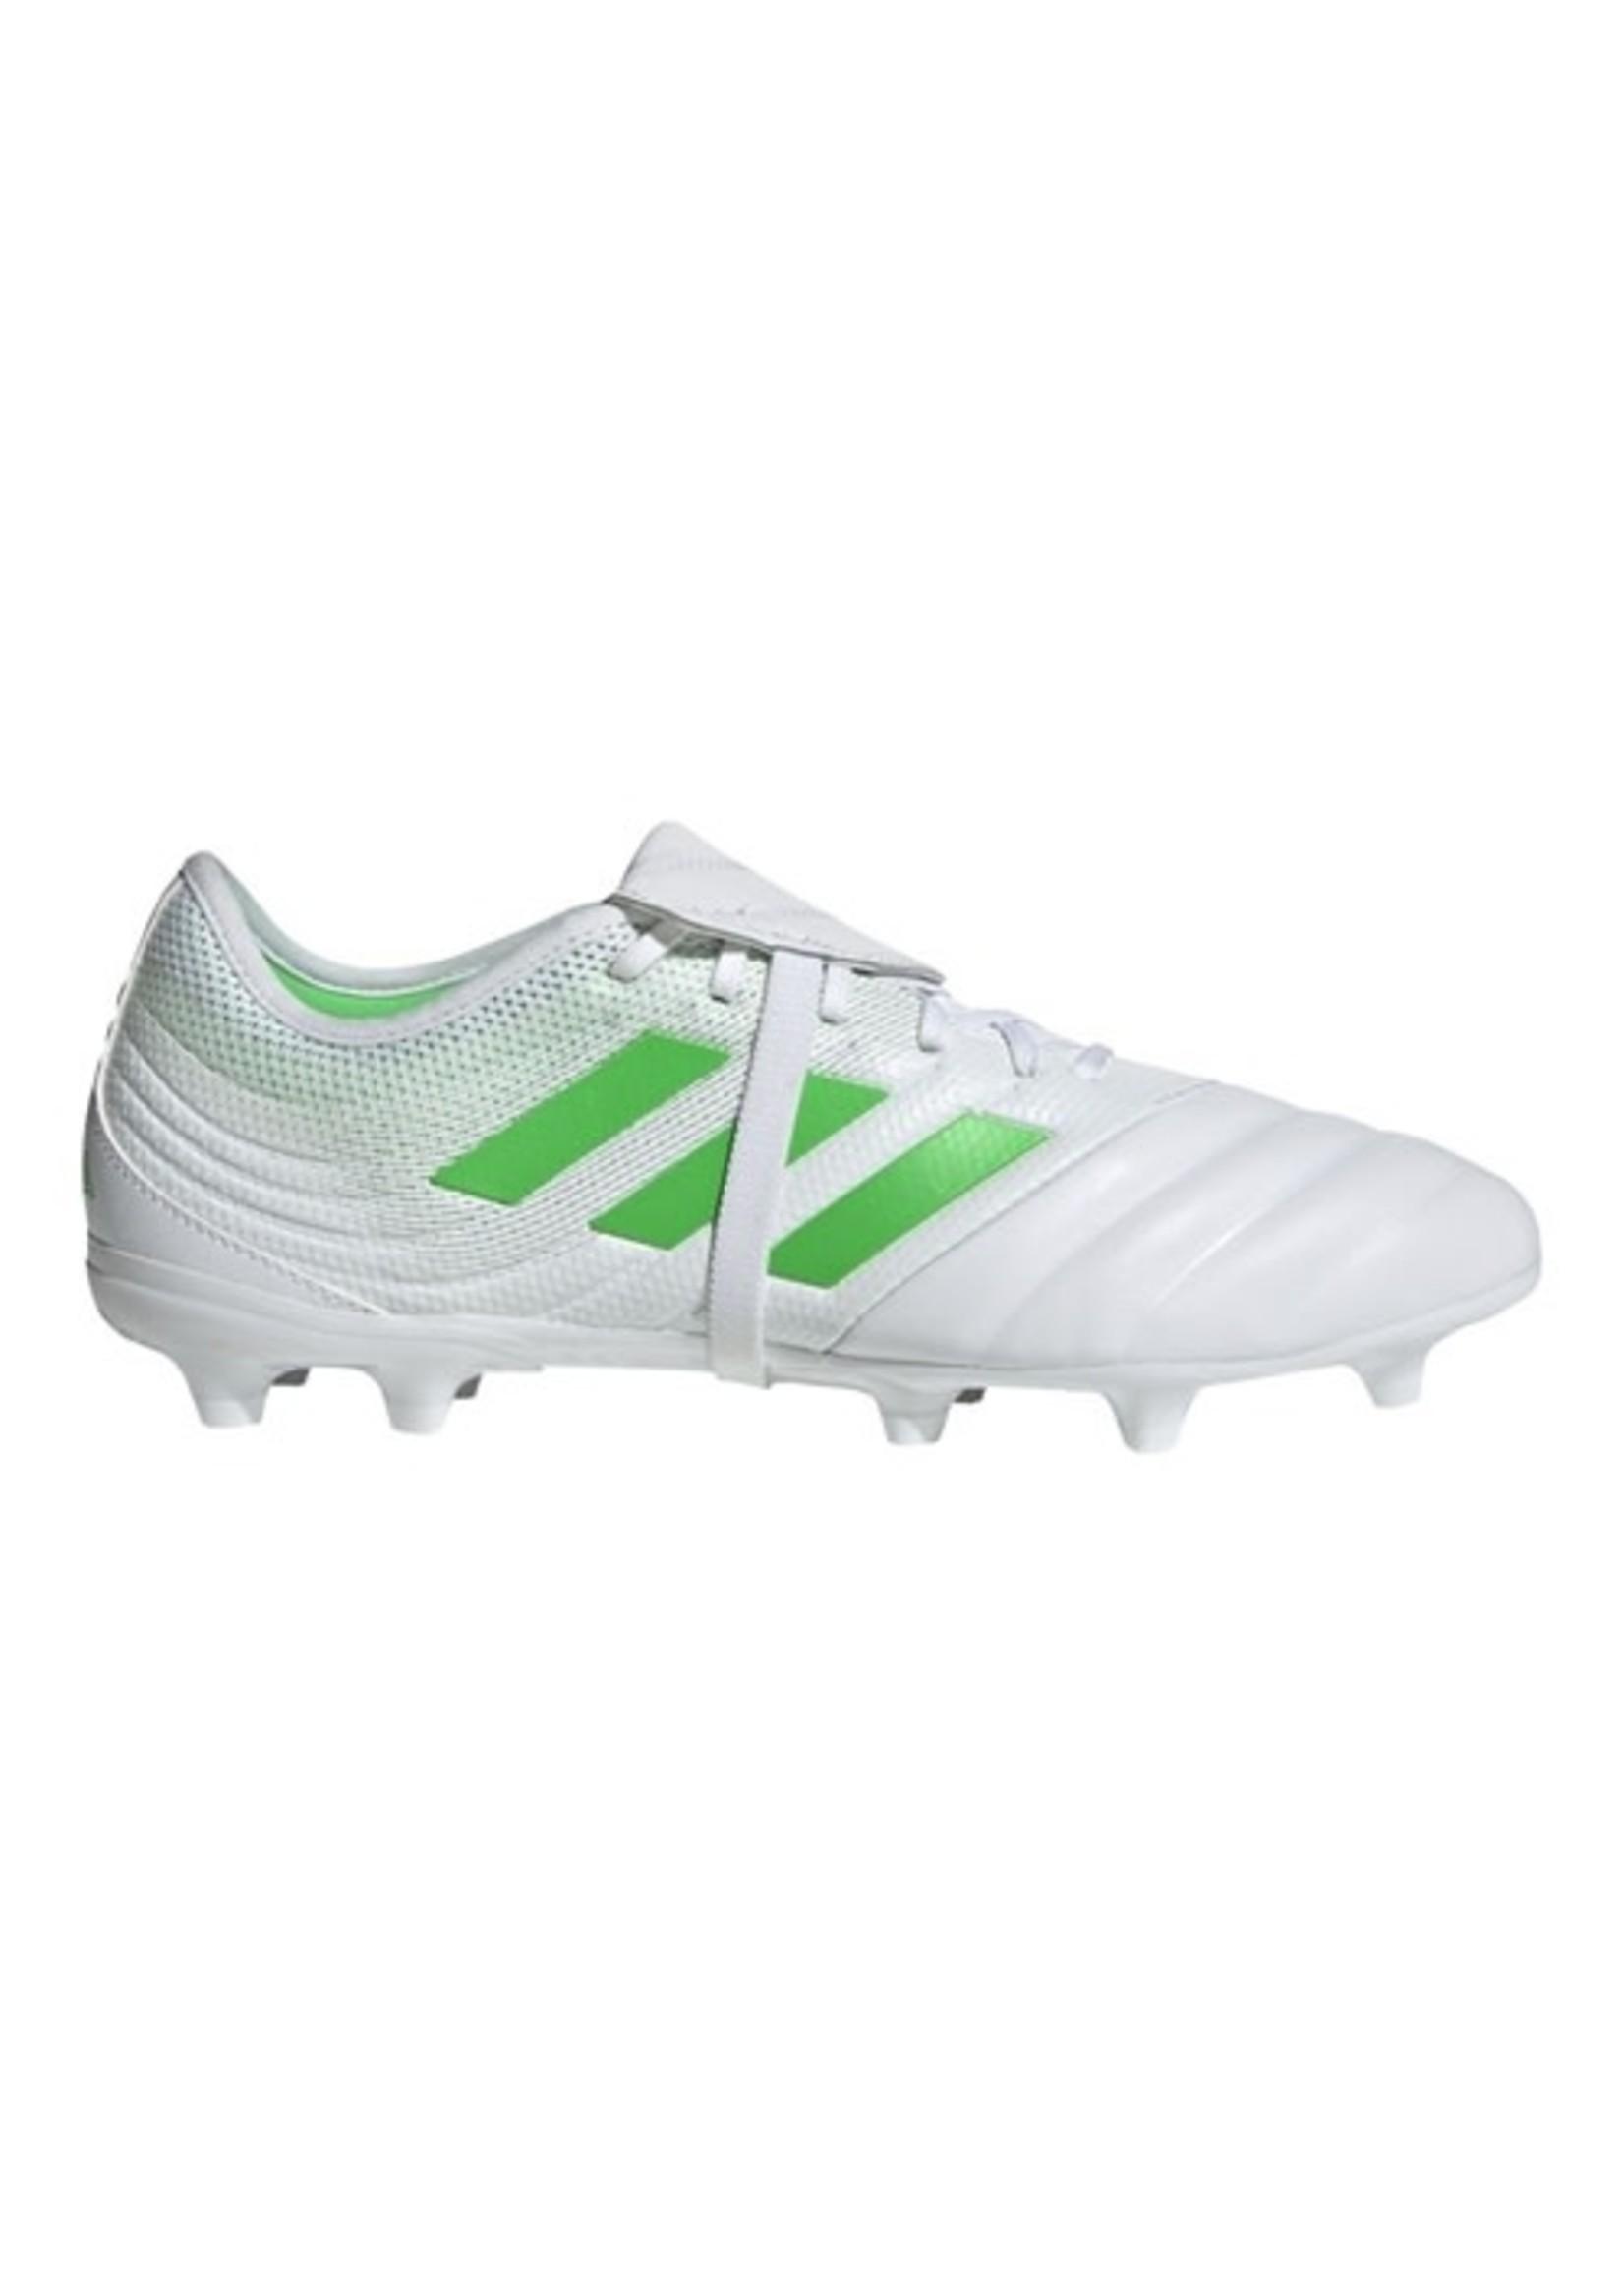 Adidas COPA GLORO 19.2